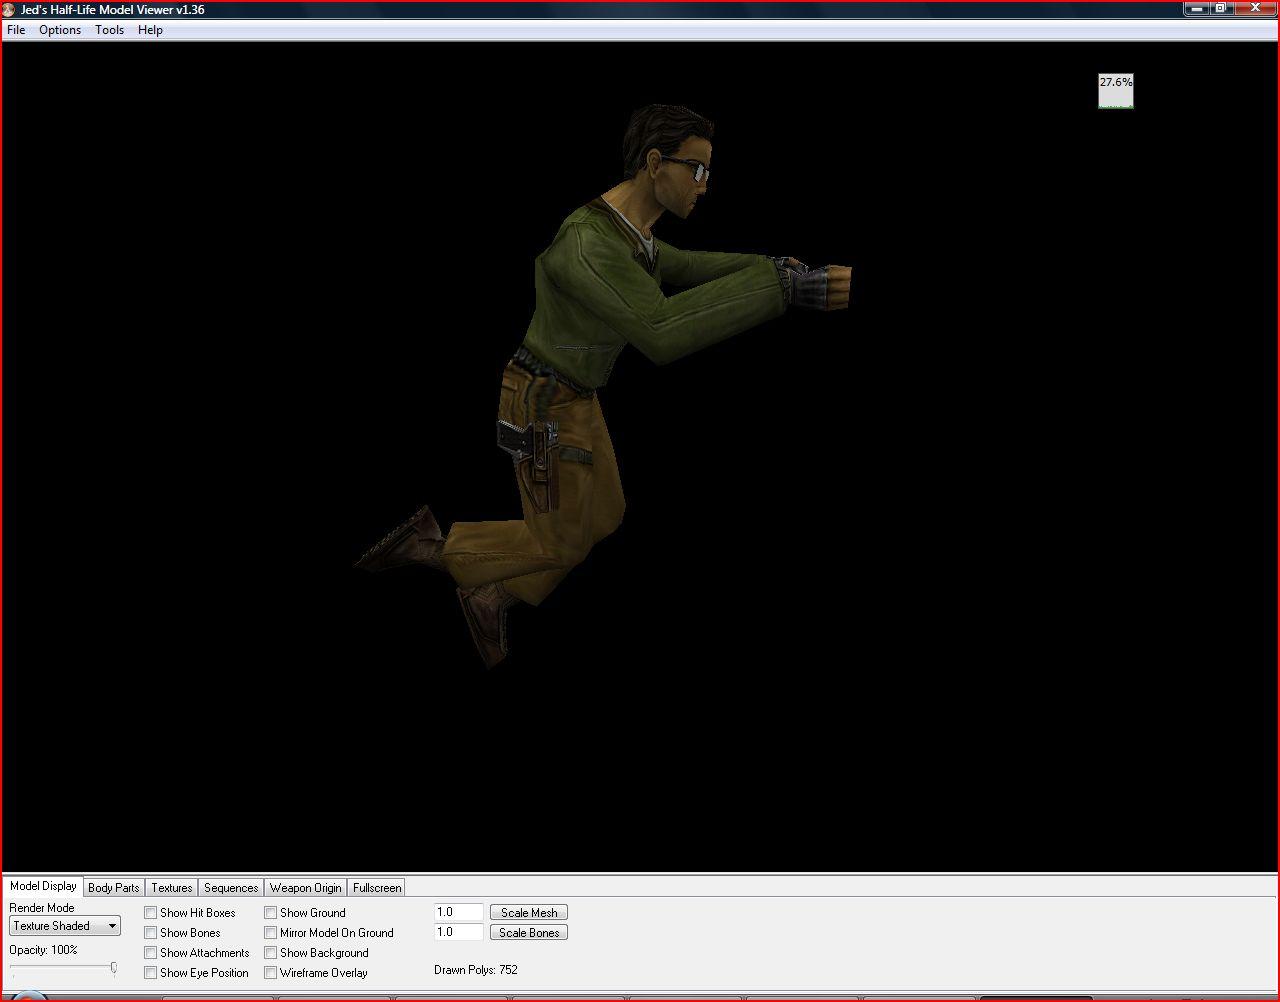 Half-life model viewer скачать jed's half-life model viewer.